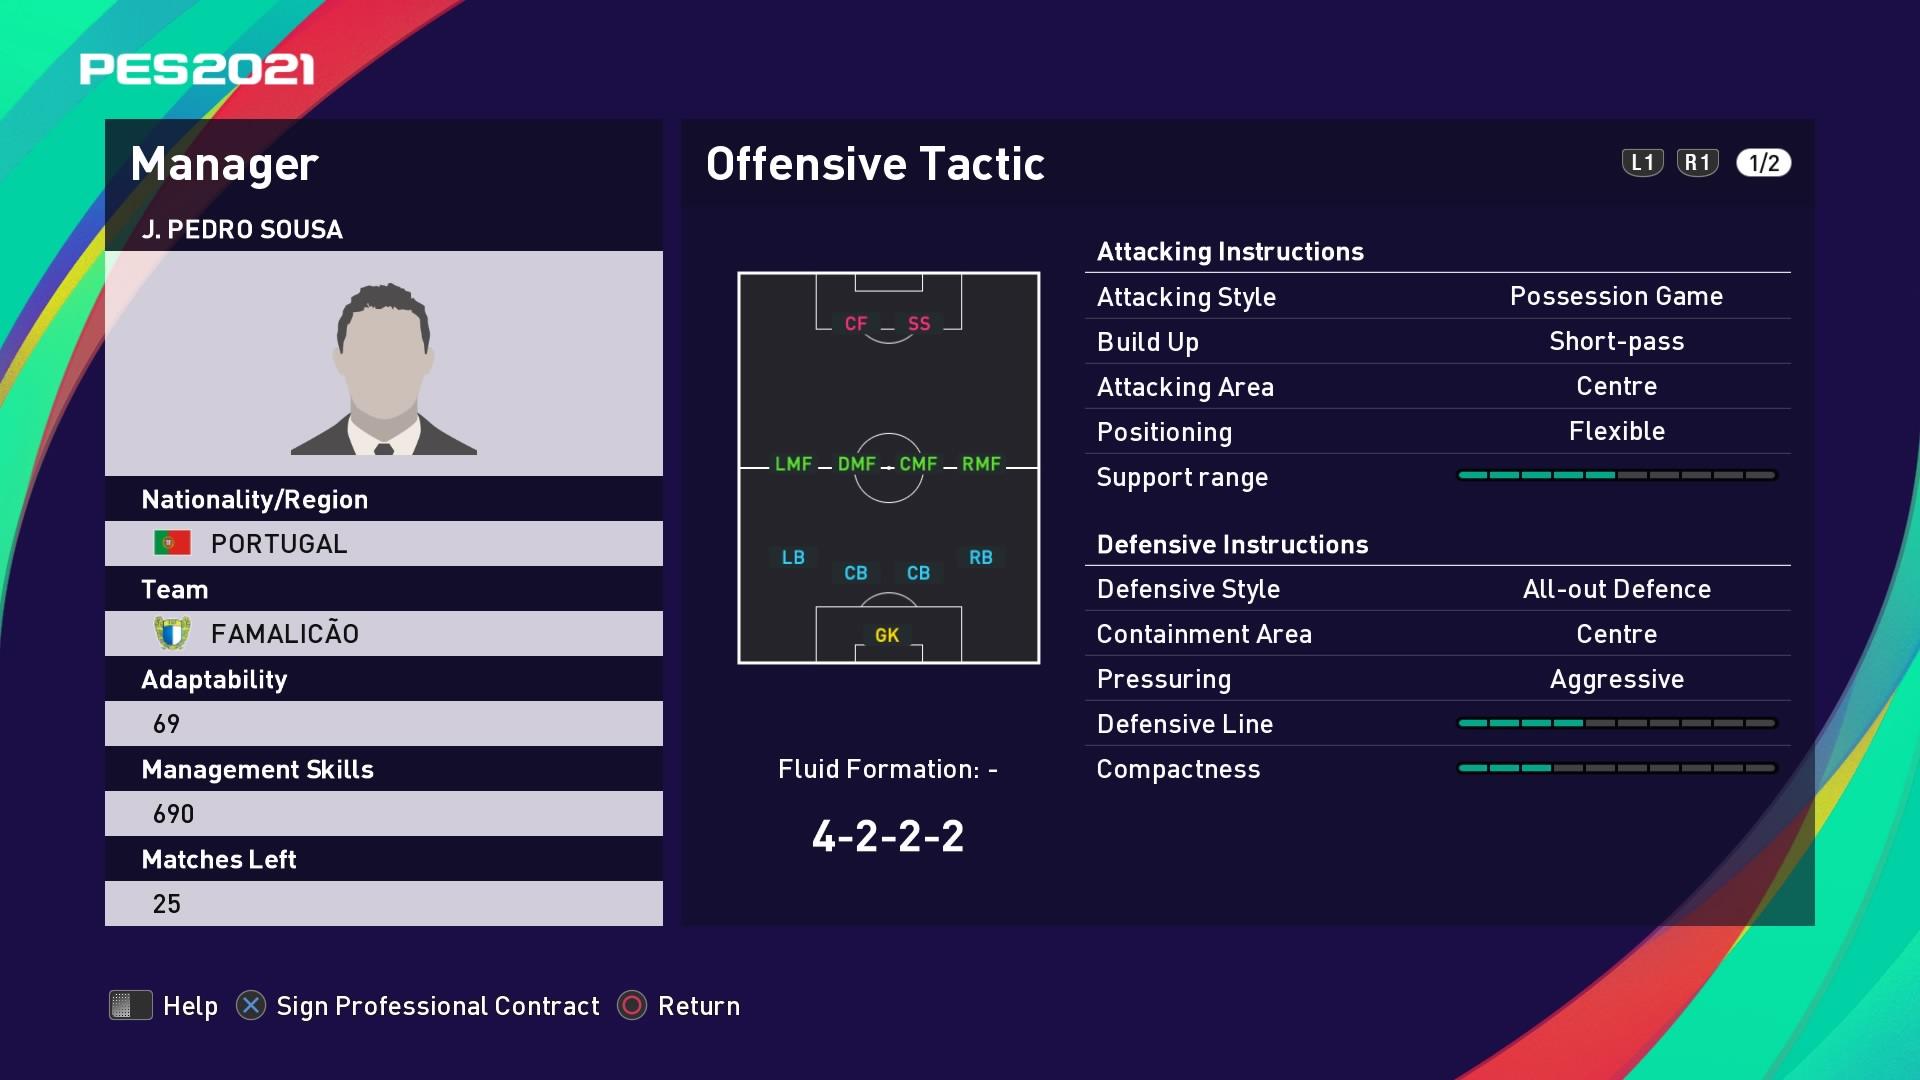 J. Pedro Sousa (João Pedro Sousa) Offensive Tactic in PES 2021 myClub